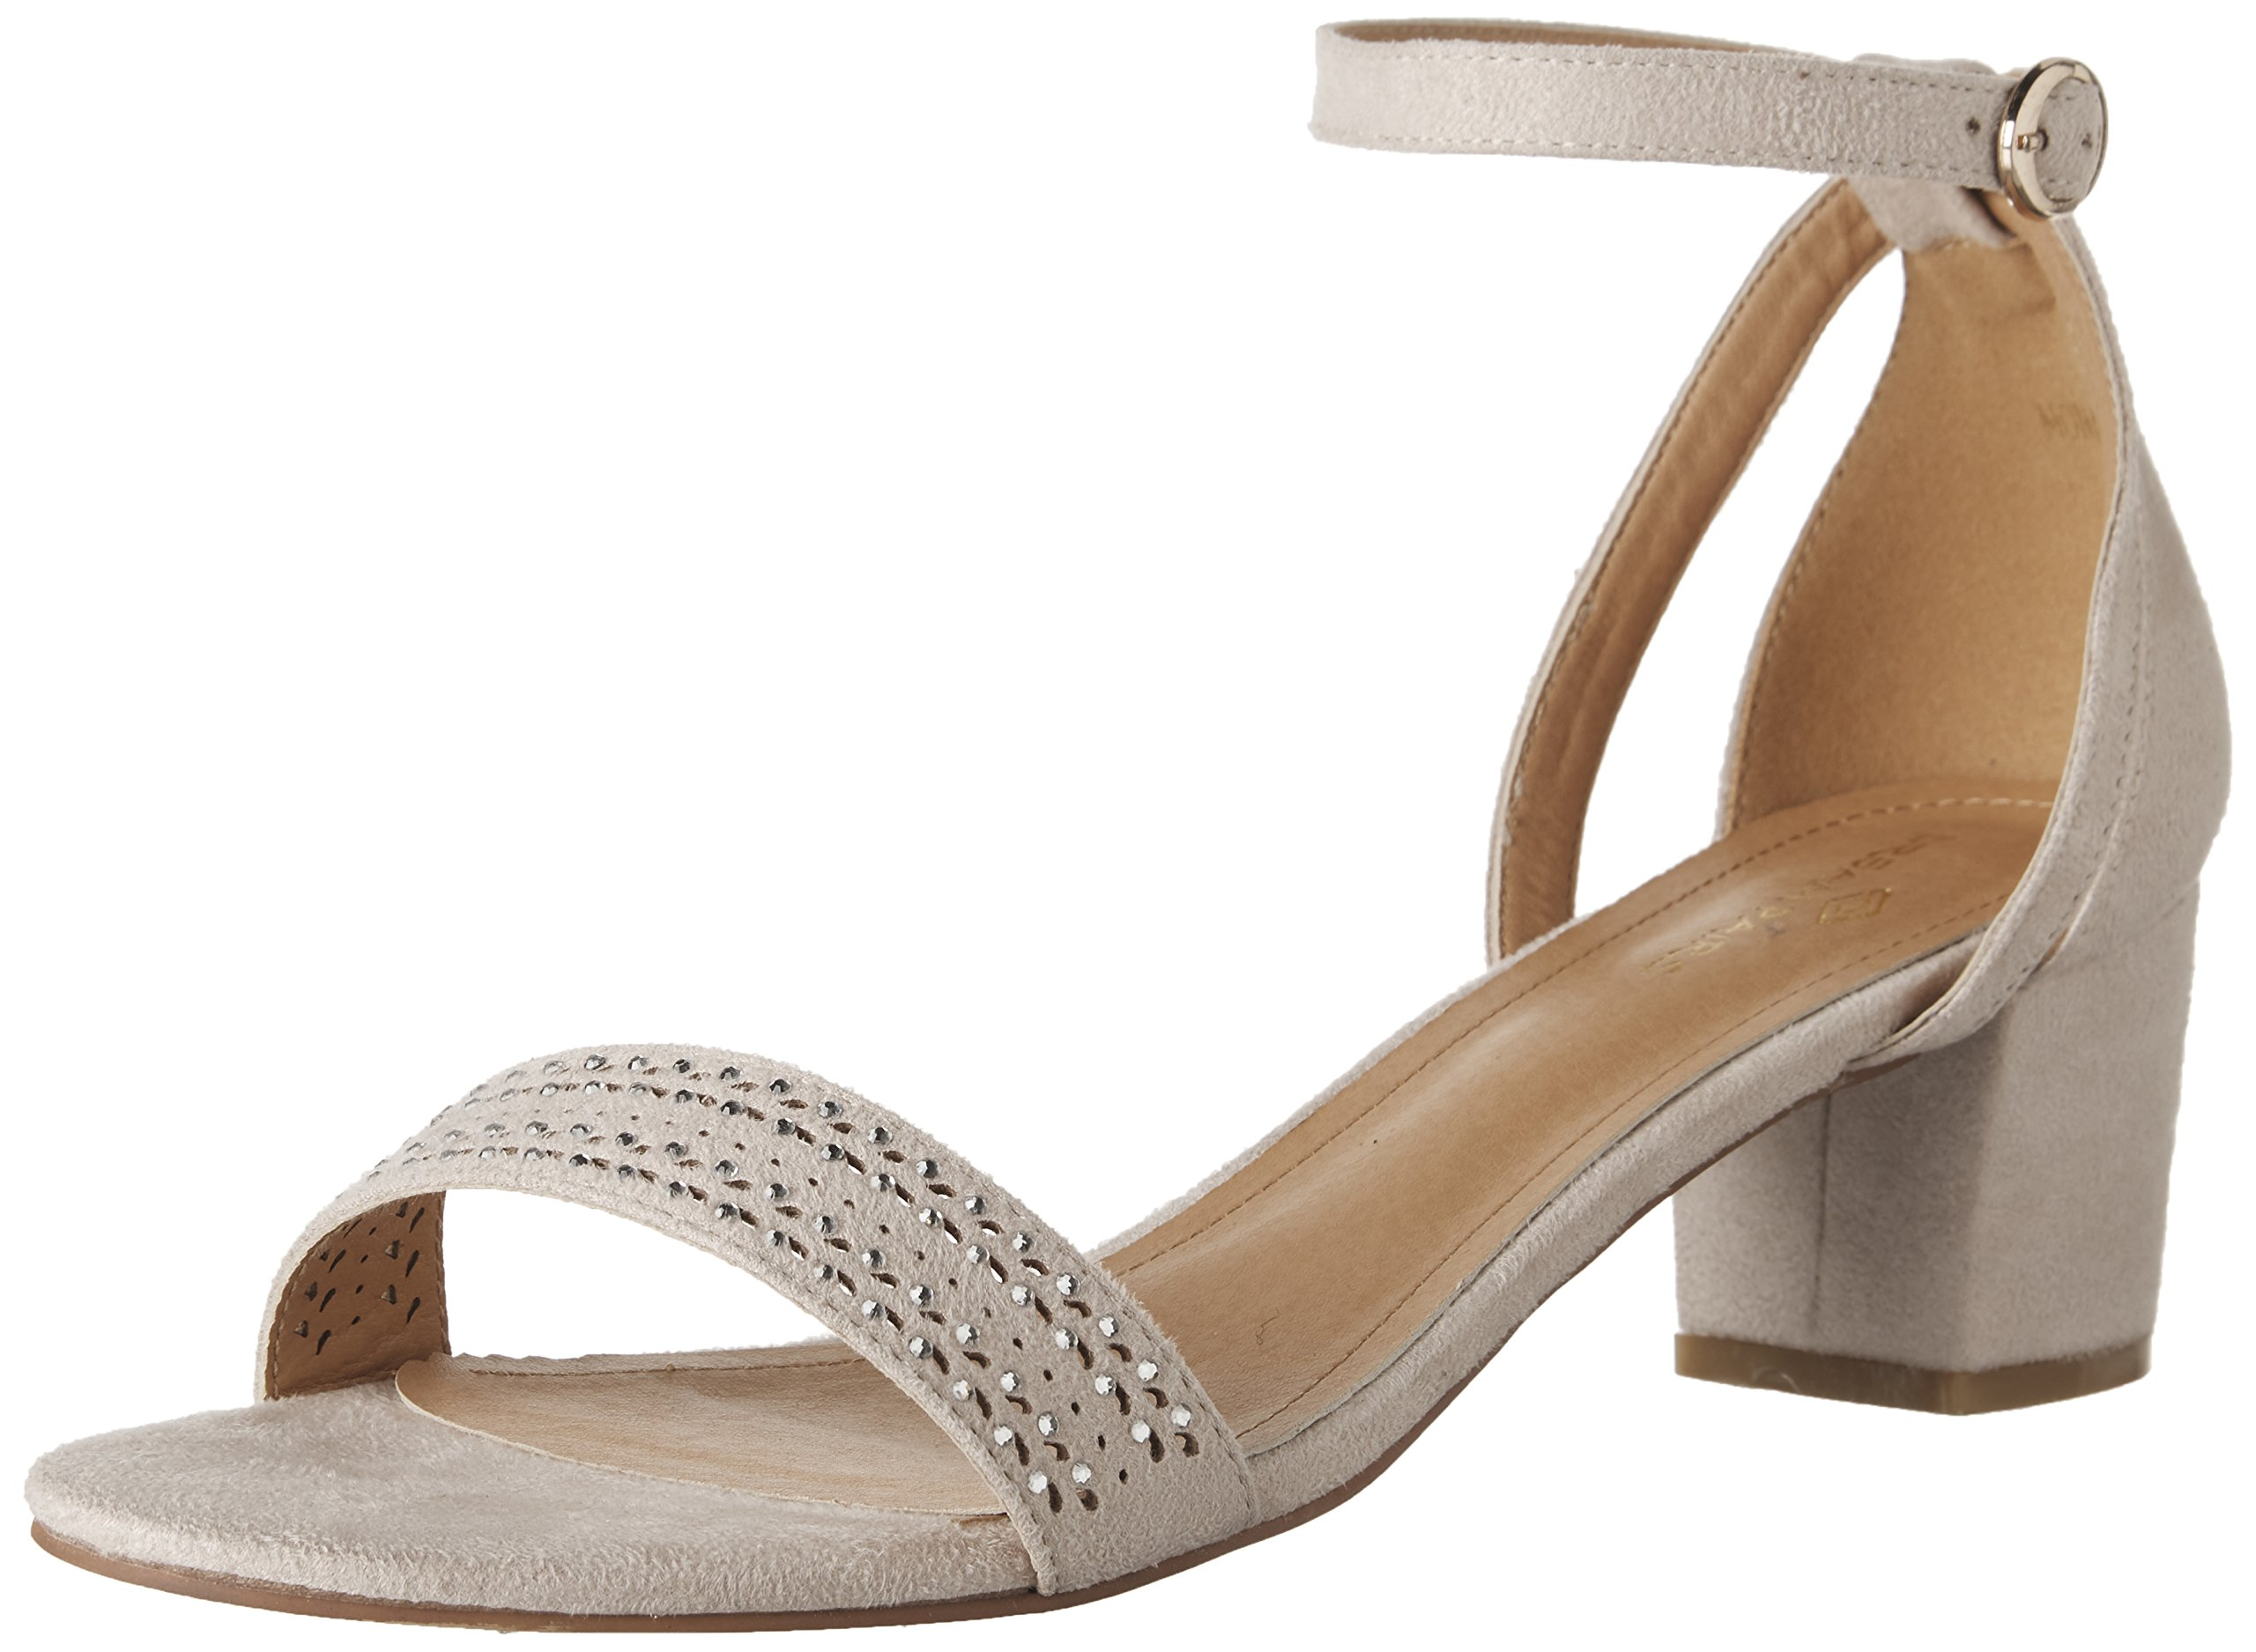 b11b873c85a2e DREAM PAIRS Women's Mona_05 Nude Fashion Block Heel Sandals Size 5.5 ...